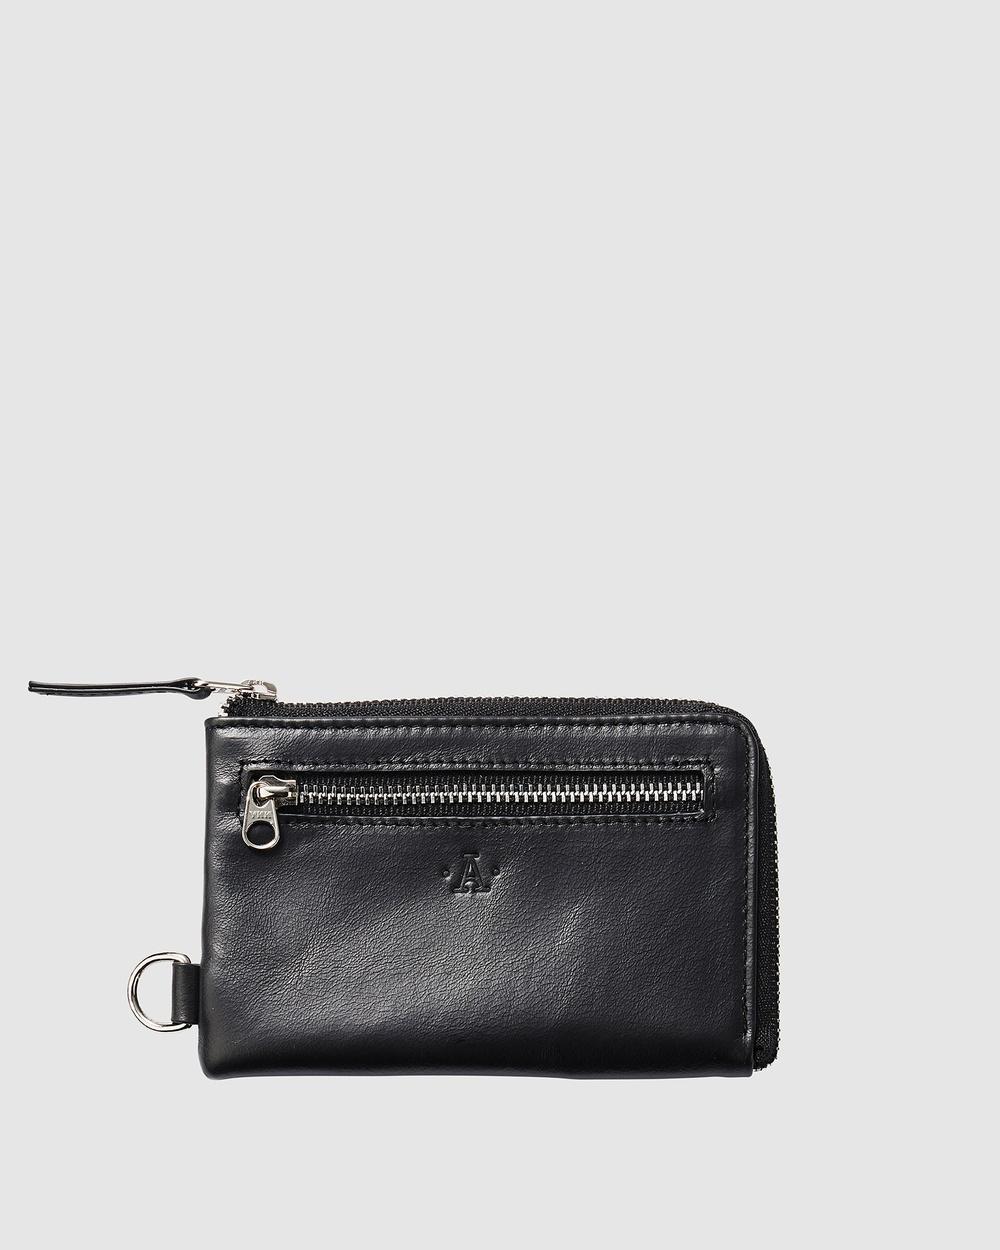 Atlas Lifestyle Co Wallet 03 Wallets Black